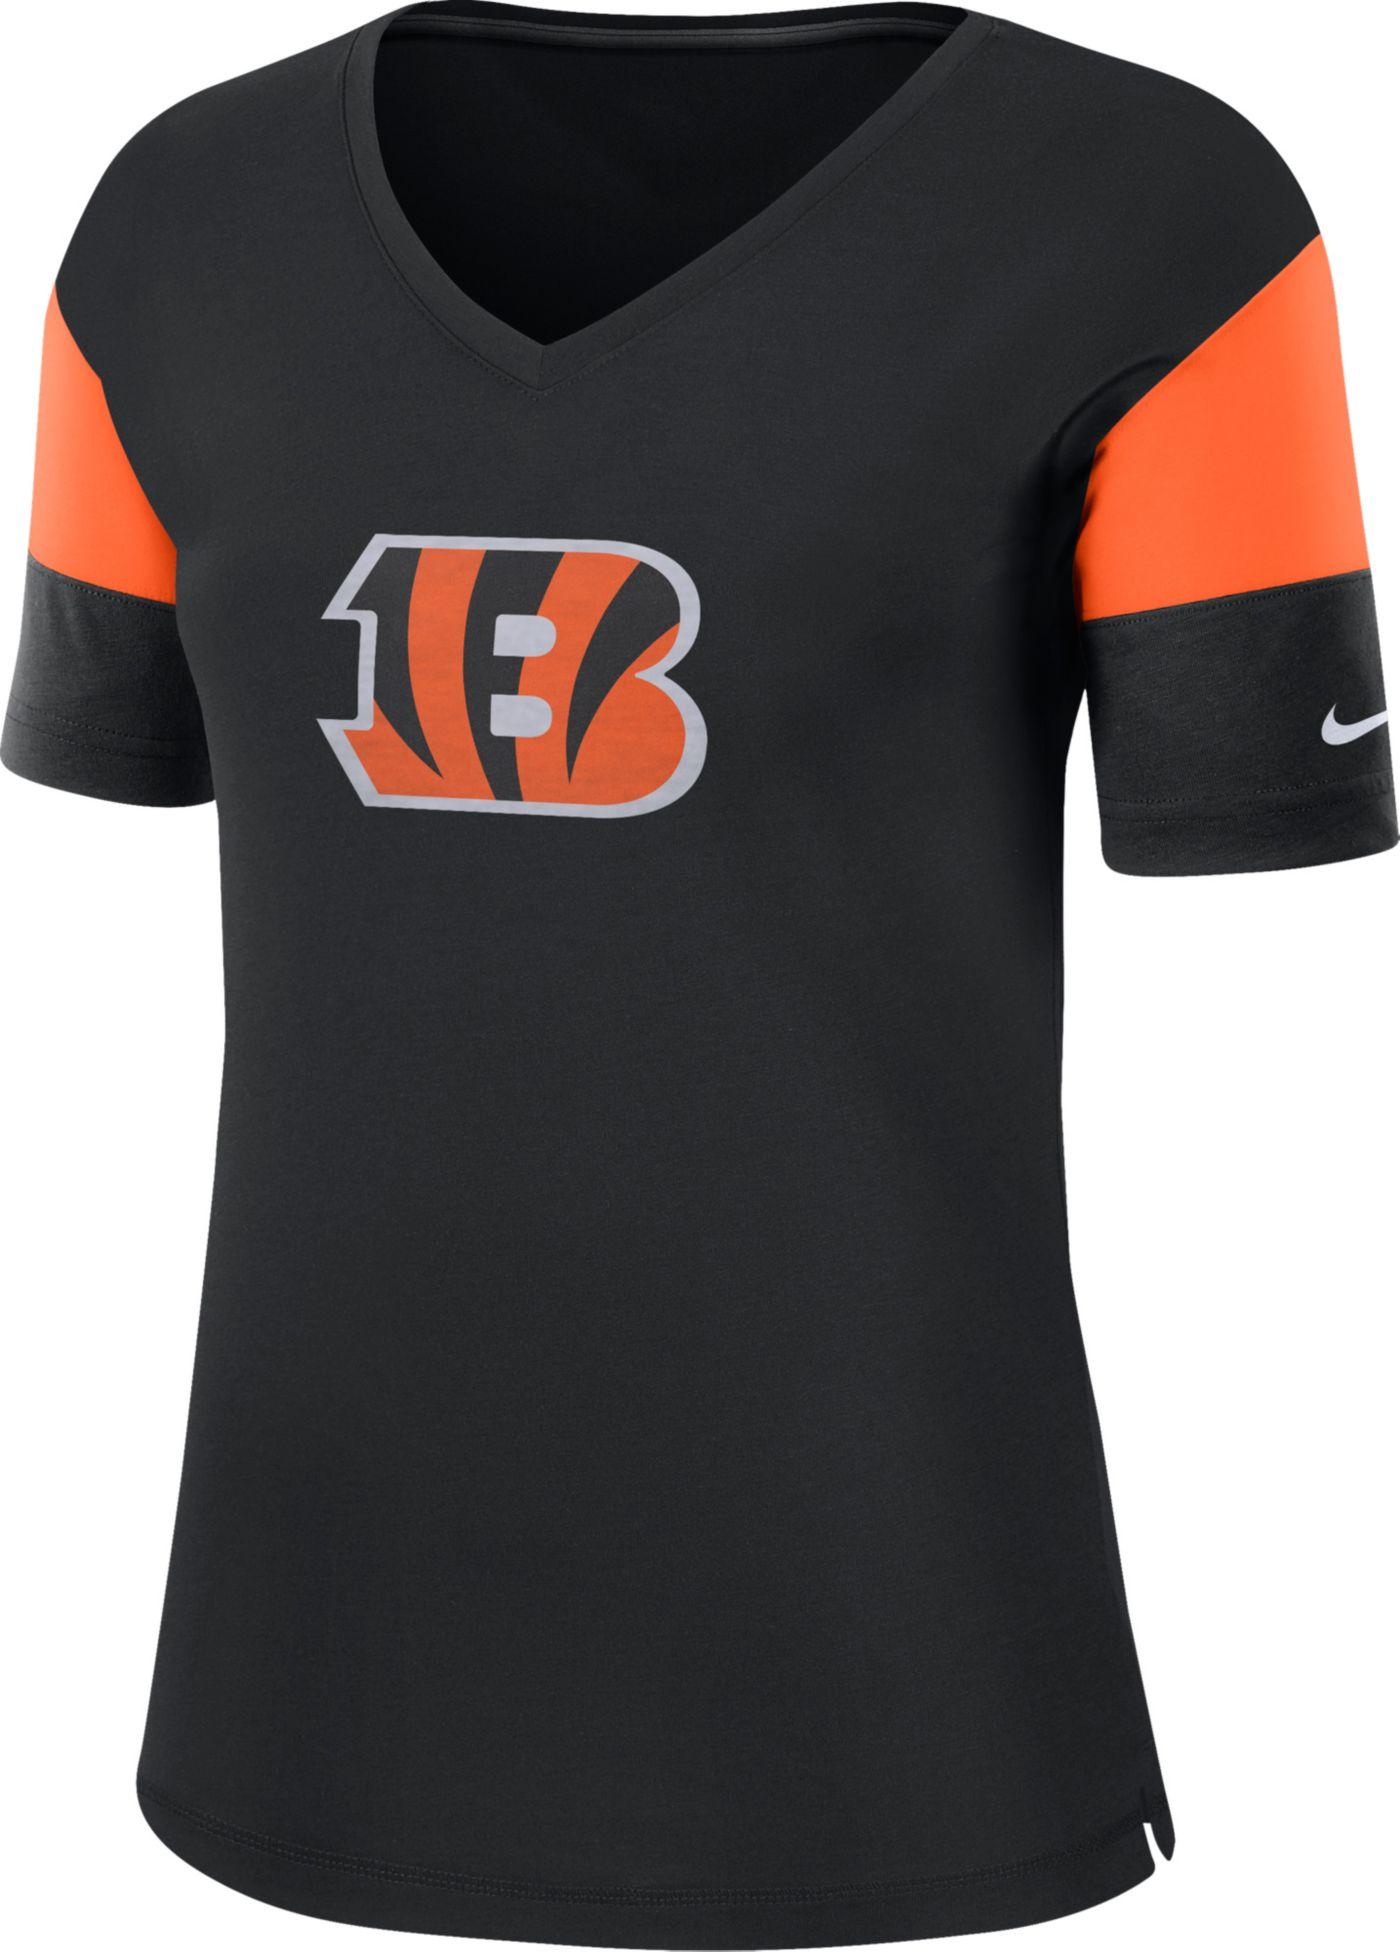 Nike Women's Cincinnati Bengals Breathe Black V-Neck T-Shirt